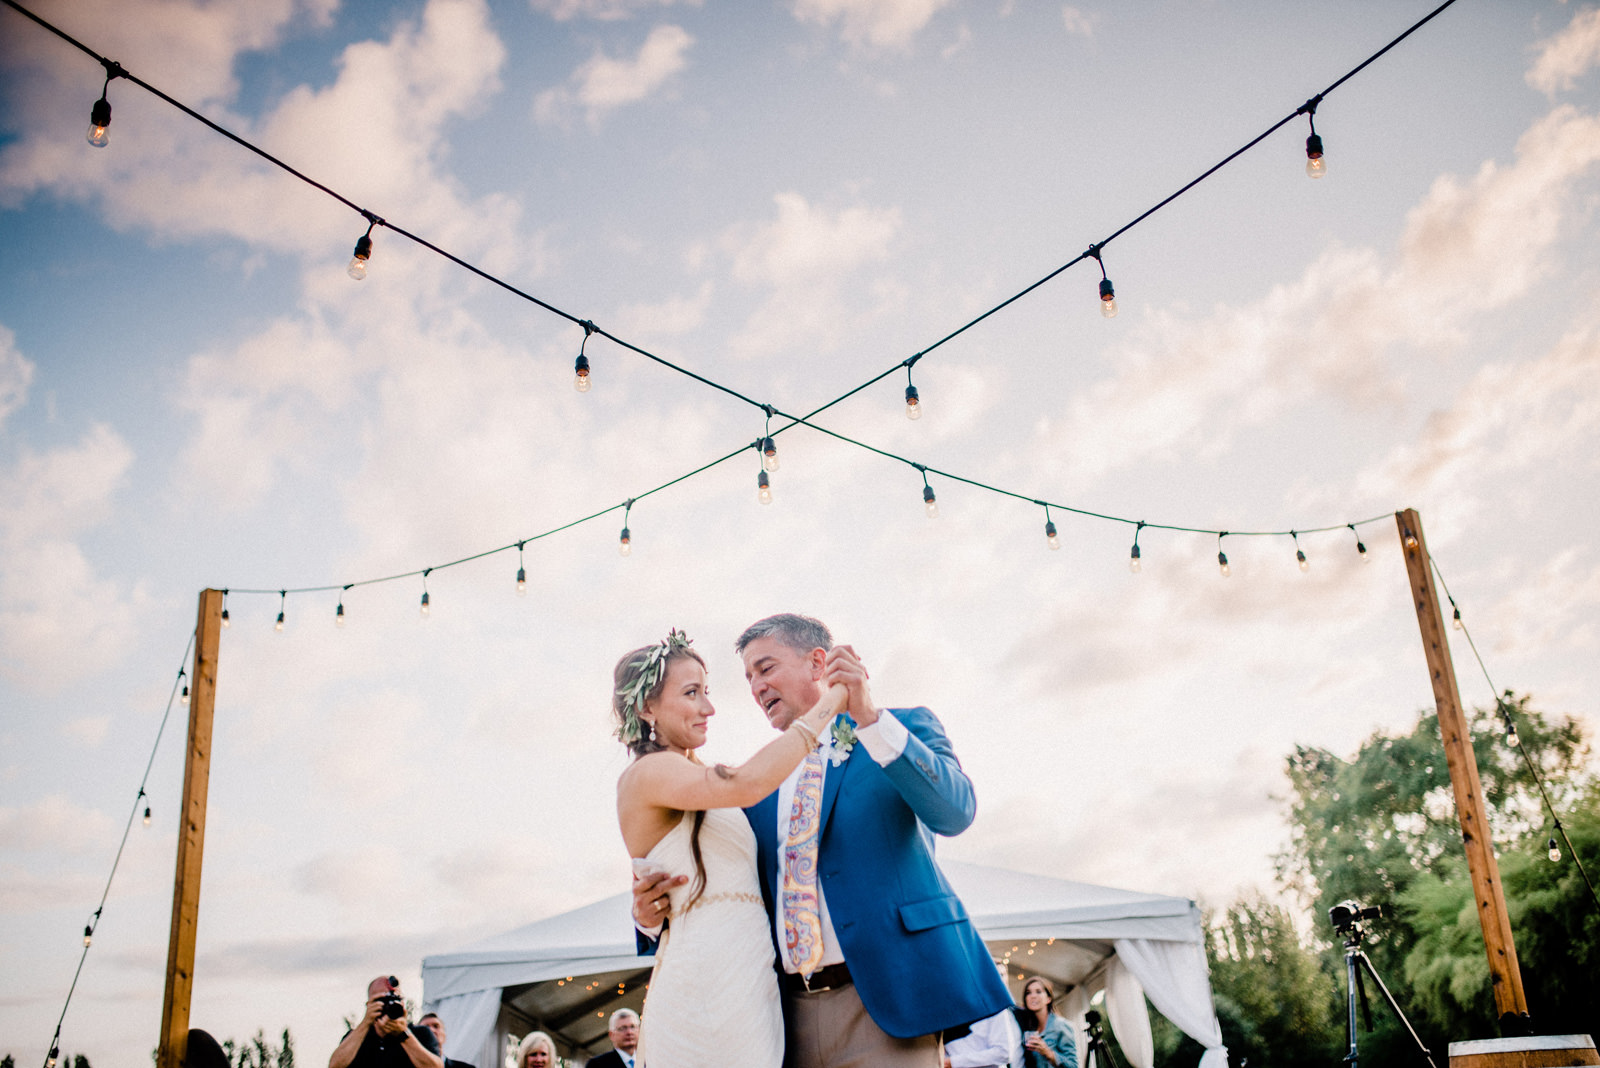 088-woodinville-lavendar-farm-wedding-with-golden-glowy-photos.jpg